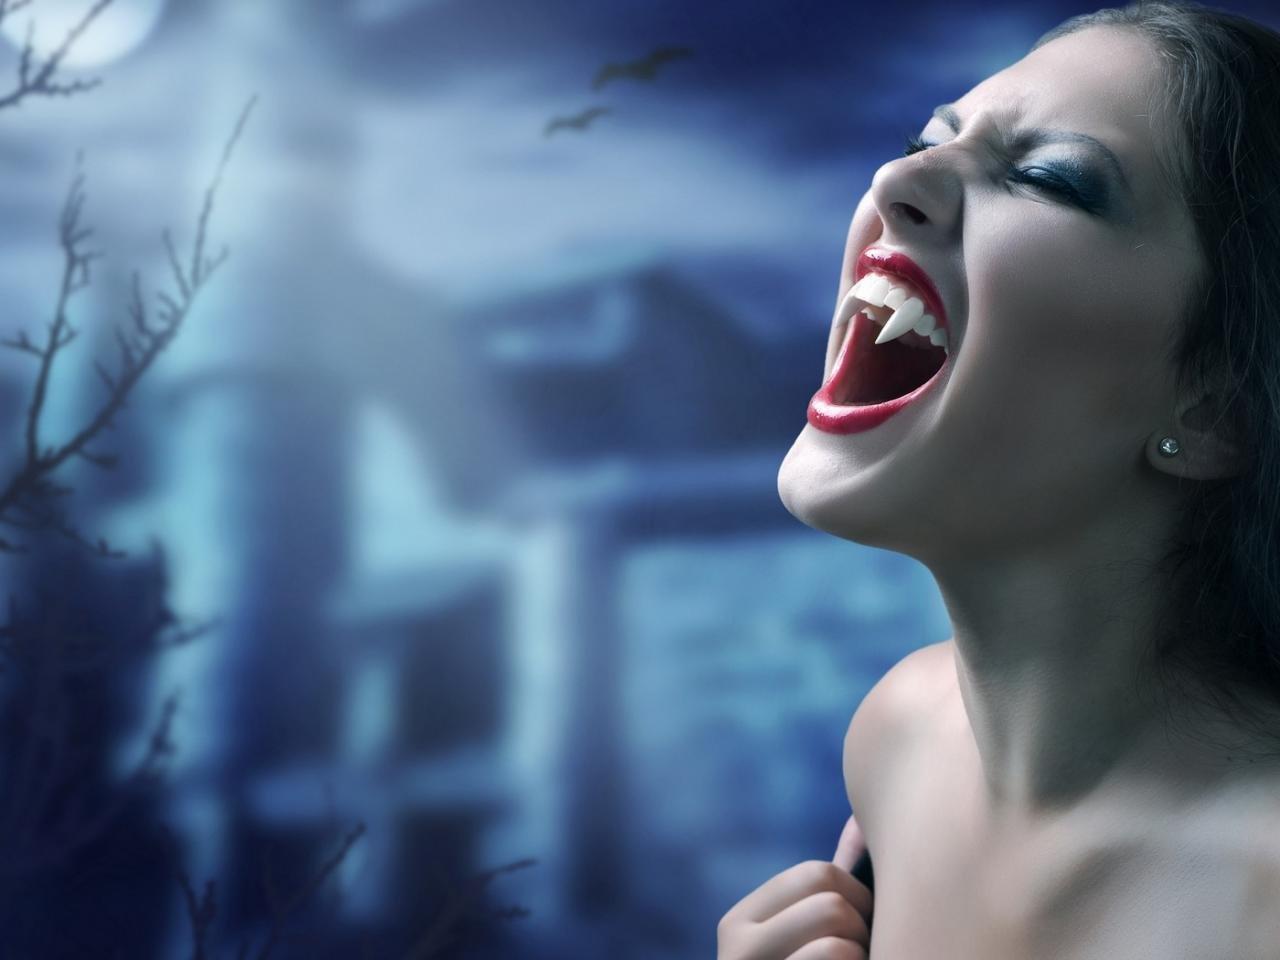 Vampire nudity fucked gallery